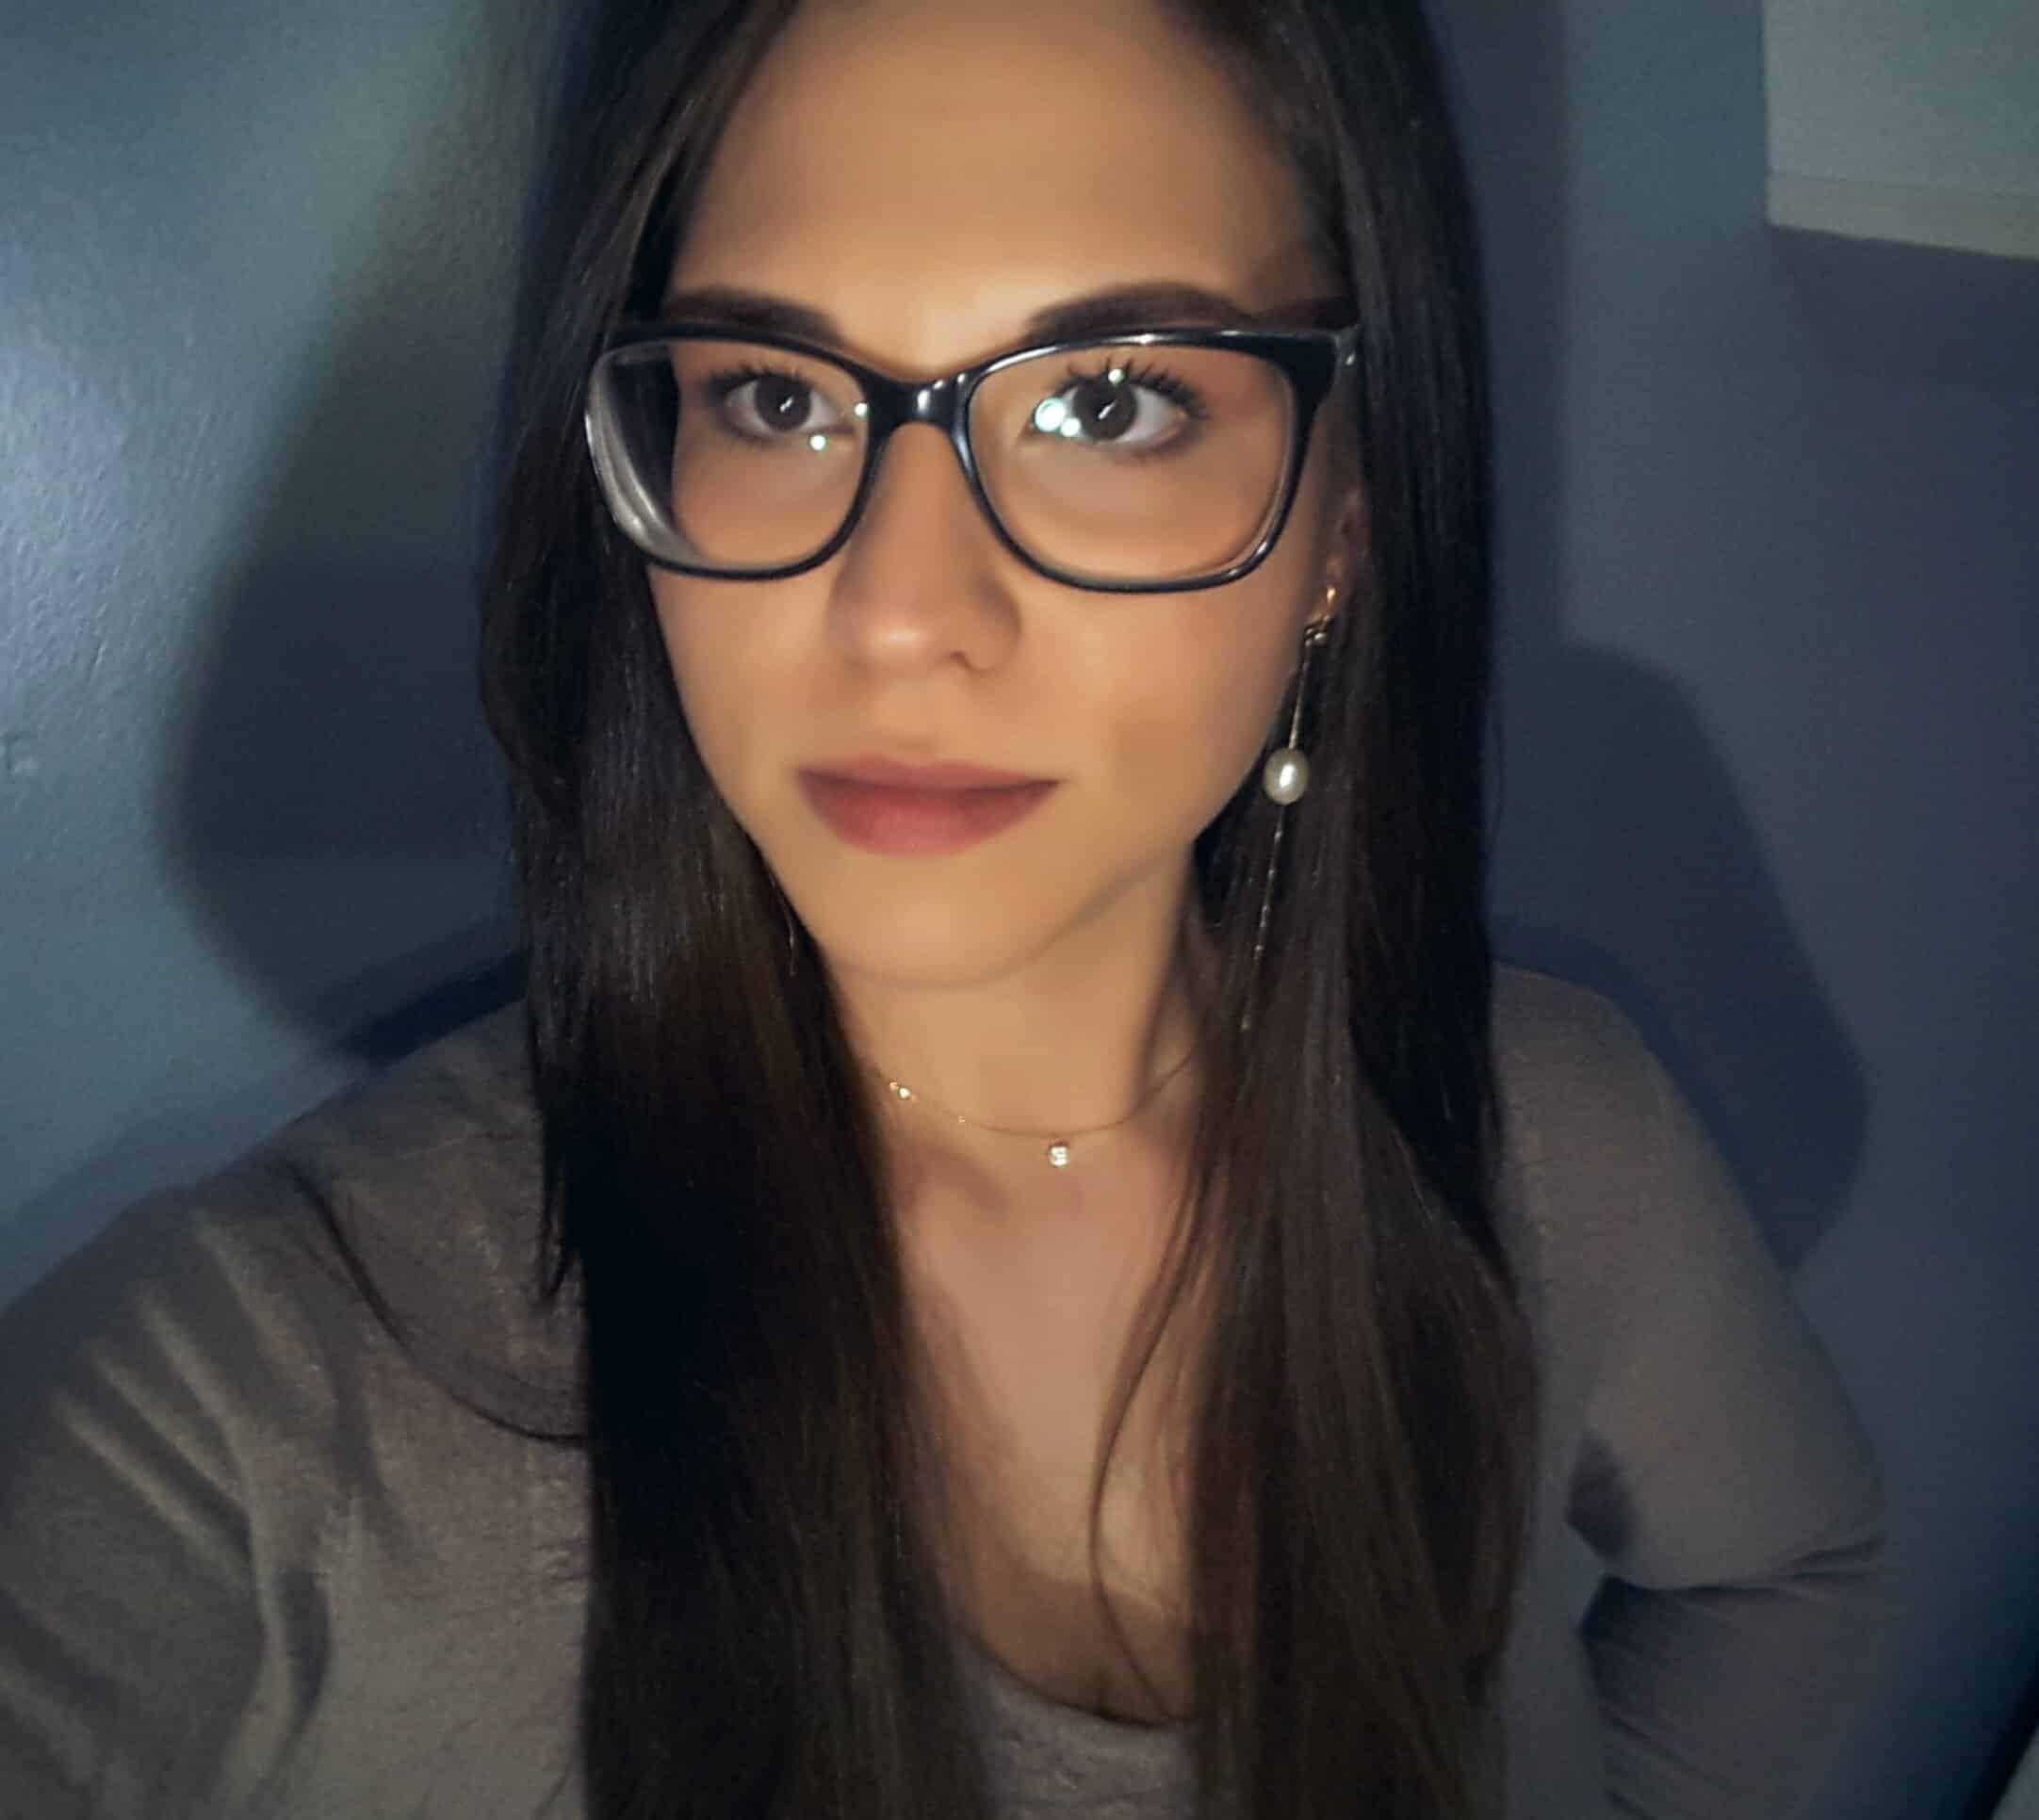 Fernanda Zanenga